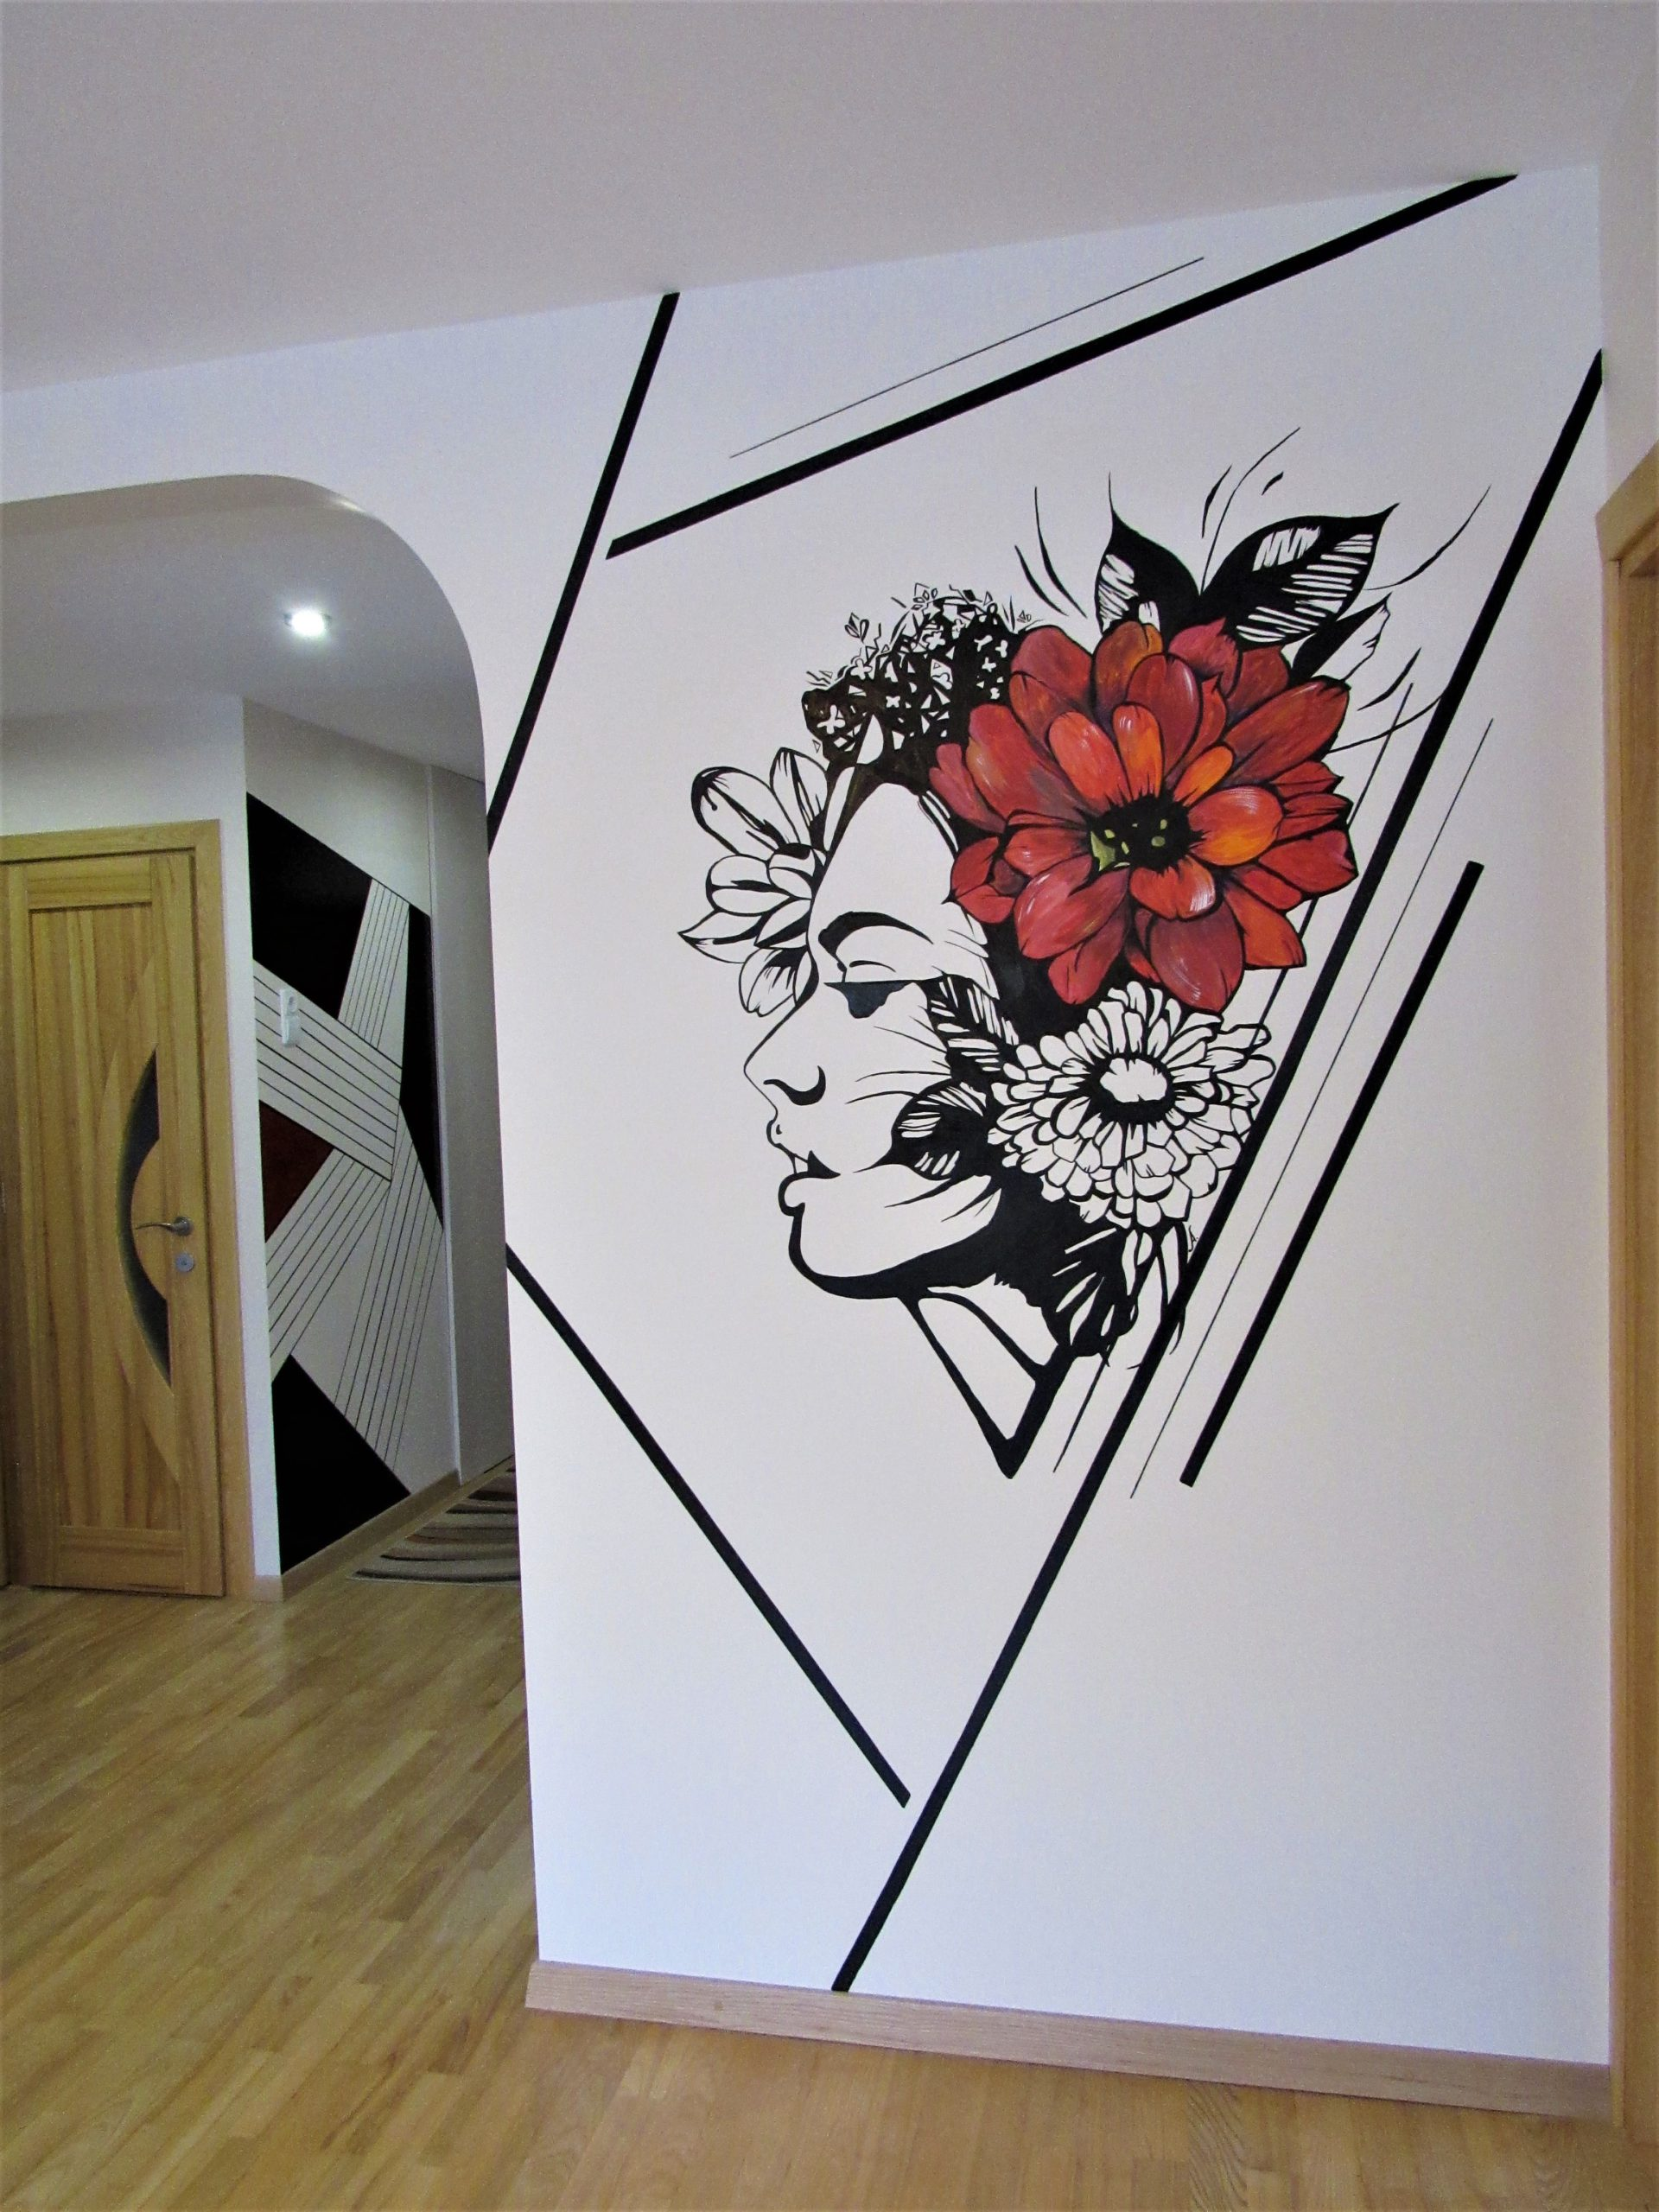 menine-kuryba-sienu-dekoravimas-ivairus-interjerai (12)